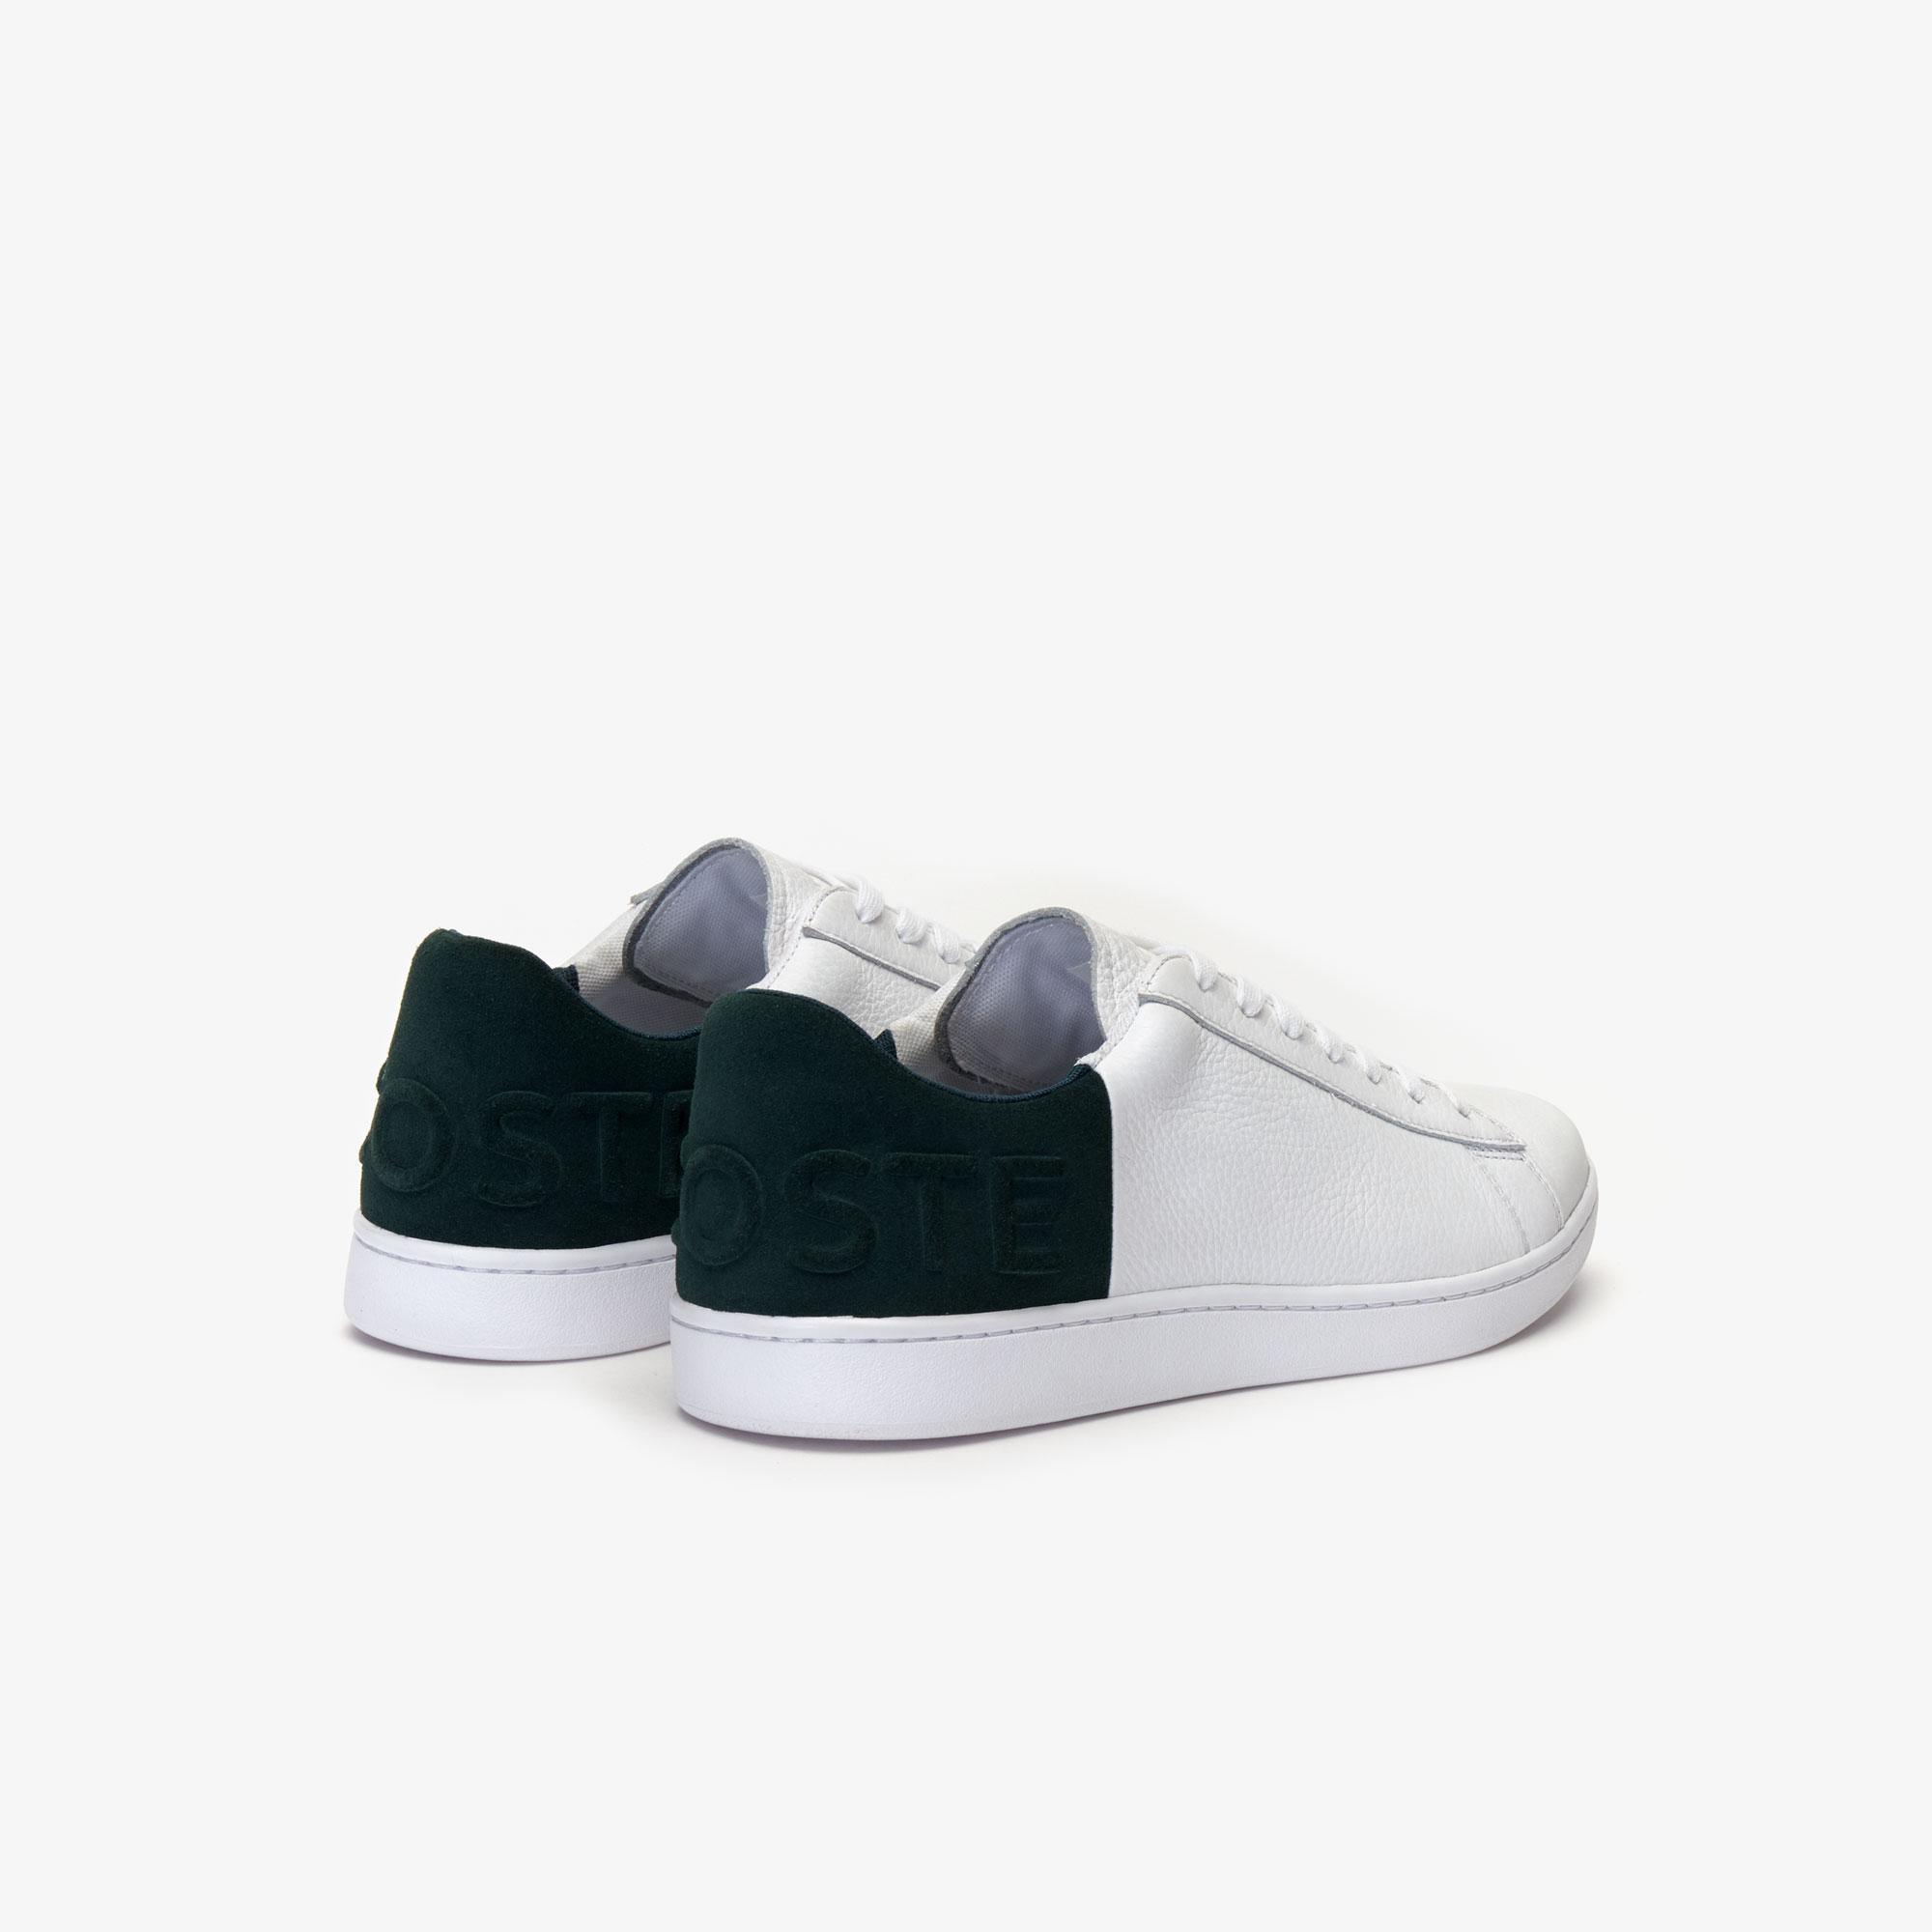 Lacoste Carnaby Evo 419 2 Sma Erkek Beyaz - Koyu Yeşil Sneaker